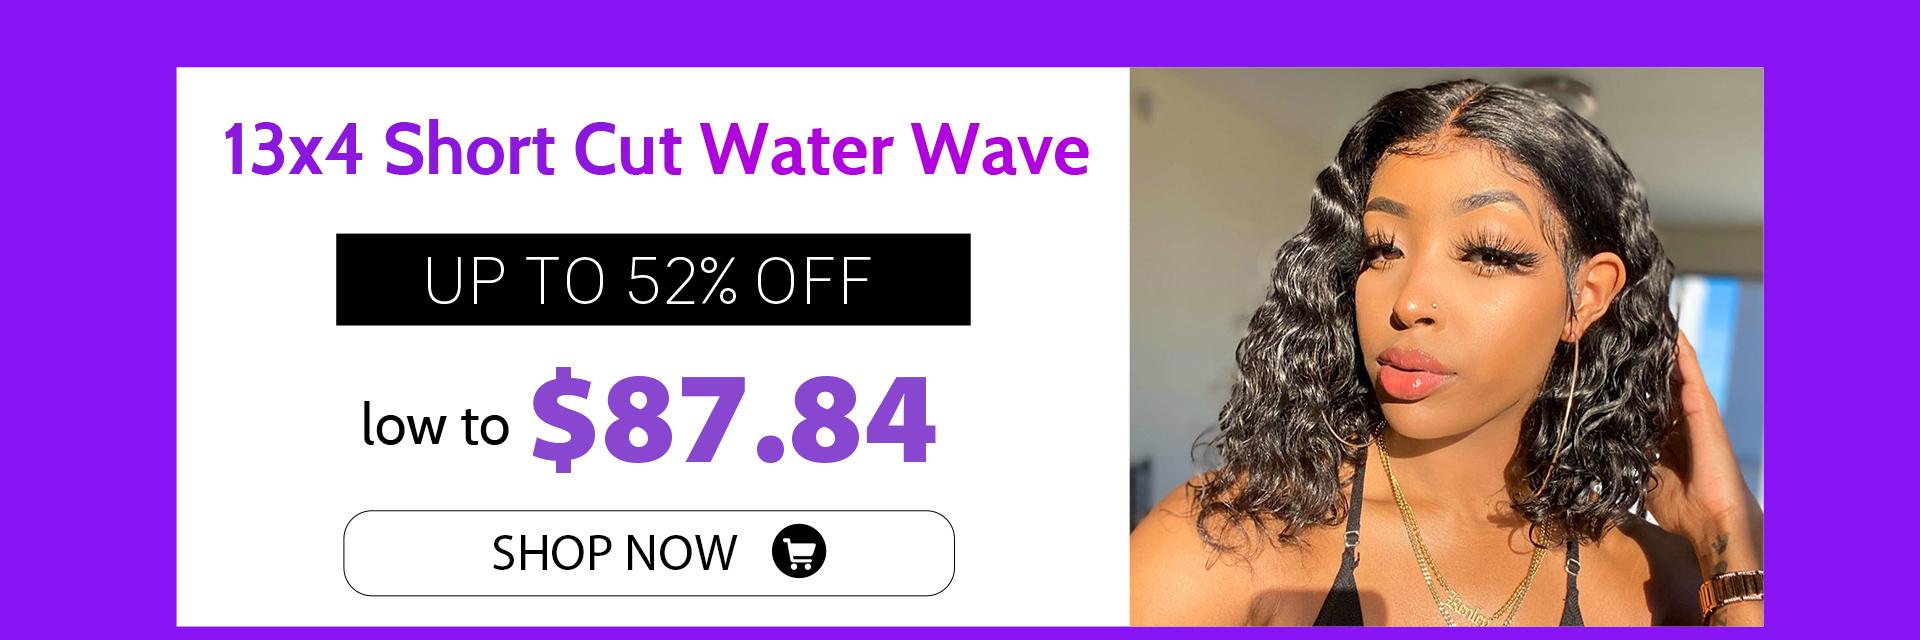 celie hair promotion